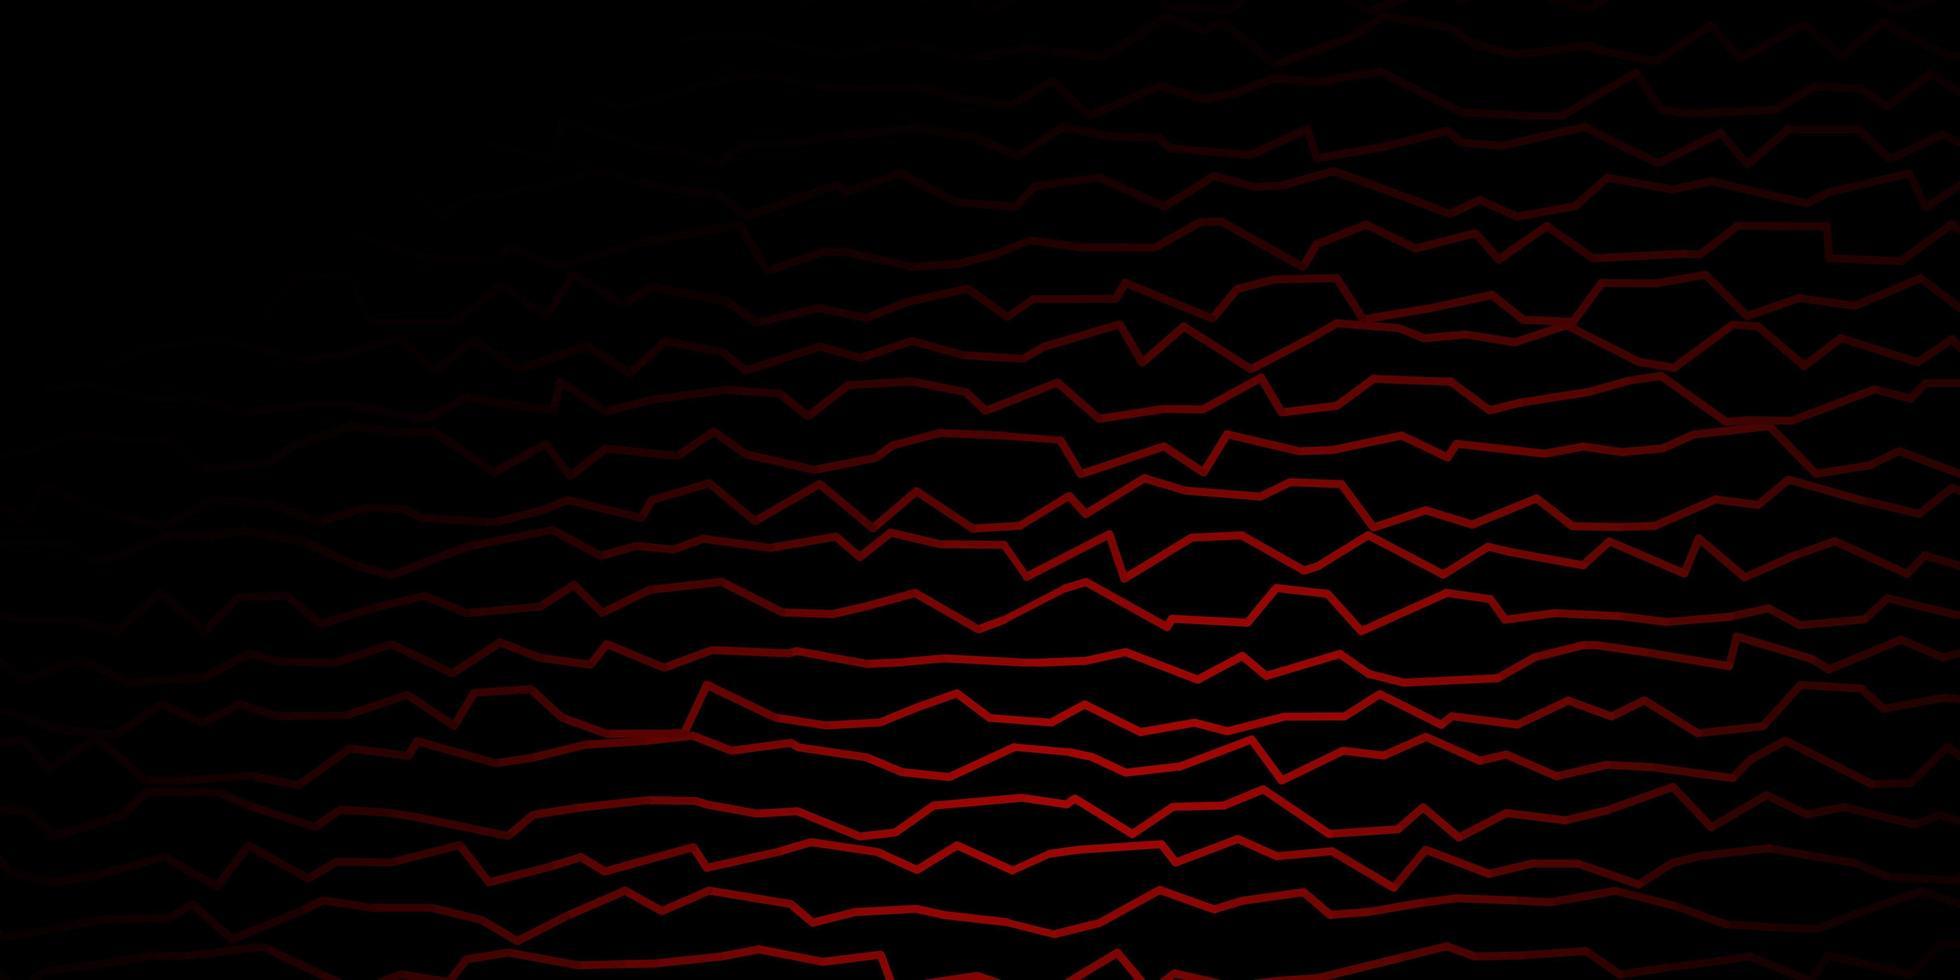 patrón de vector rojo oscuro con líneas torcidas.